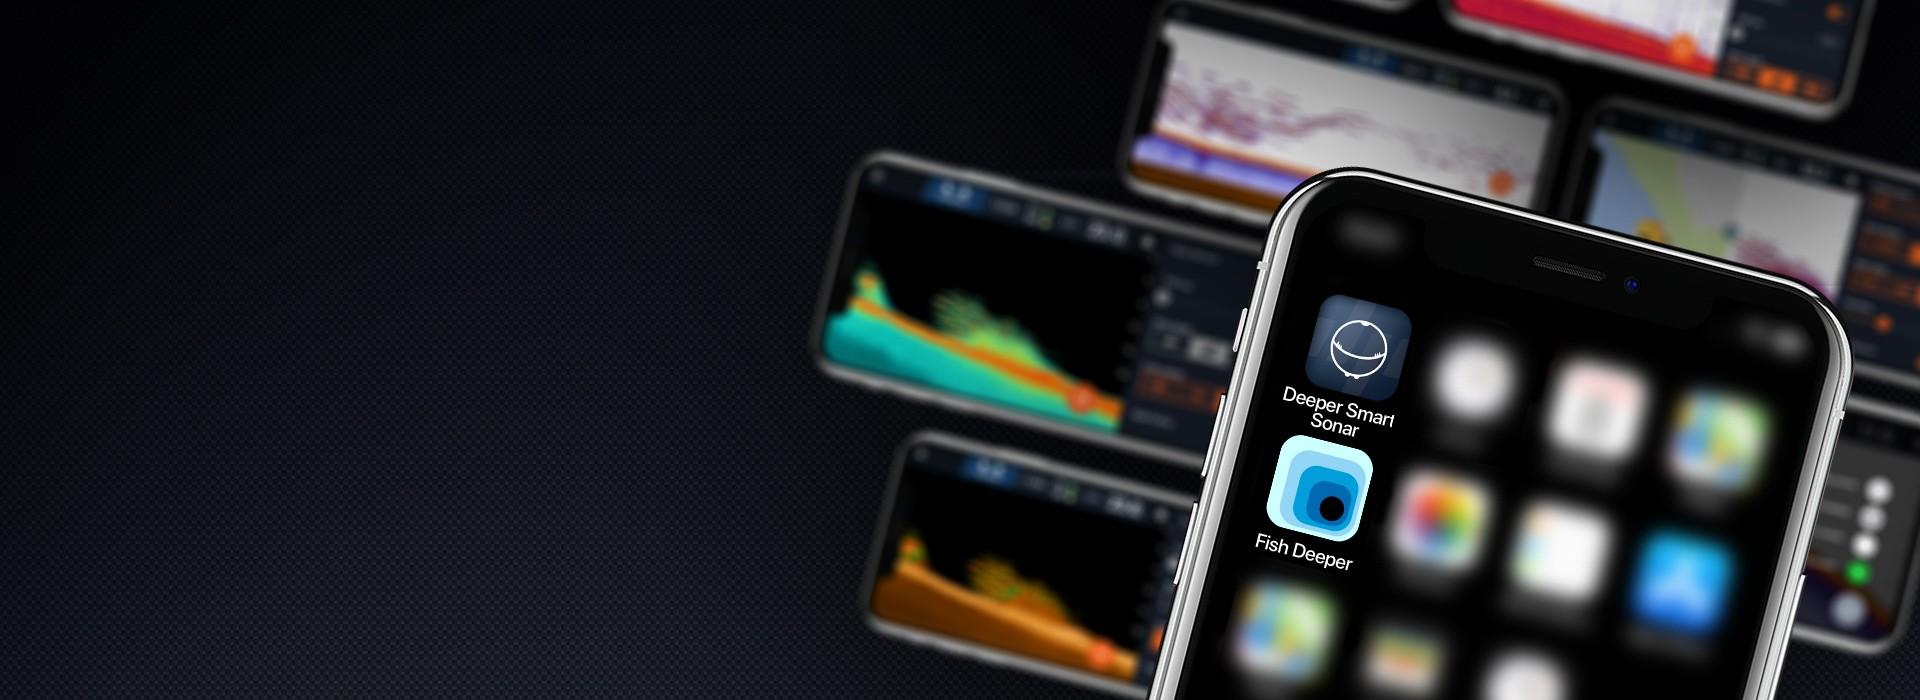 DeeperAppsDos Apps. Múltiples posibilidades de pesca.